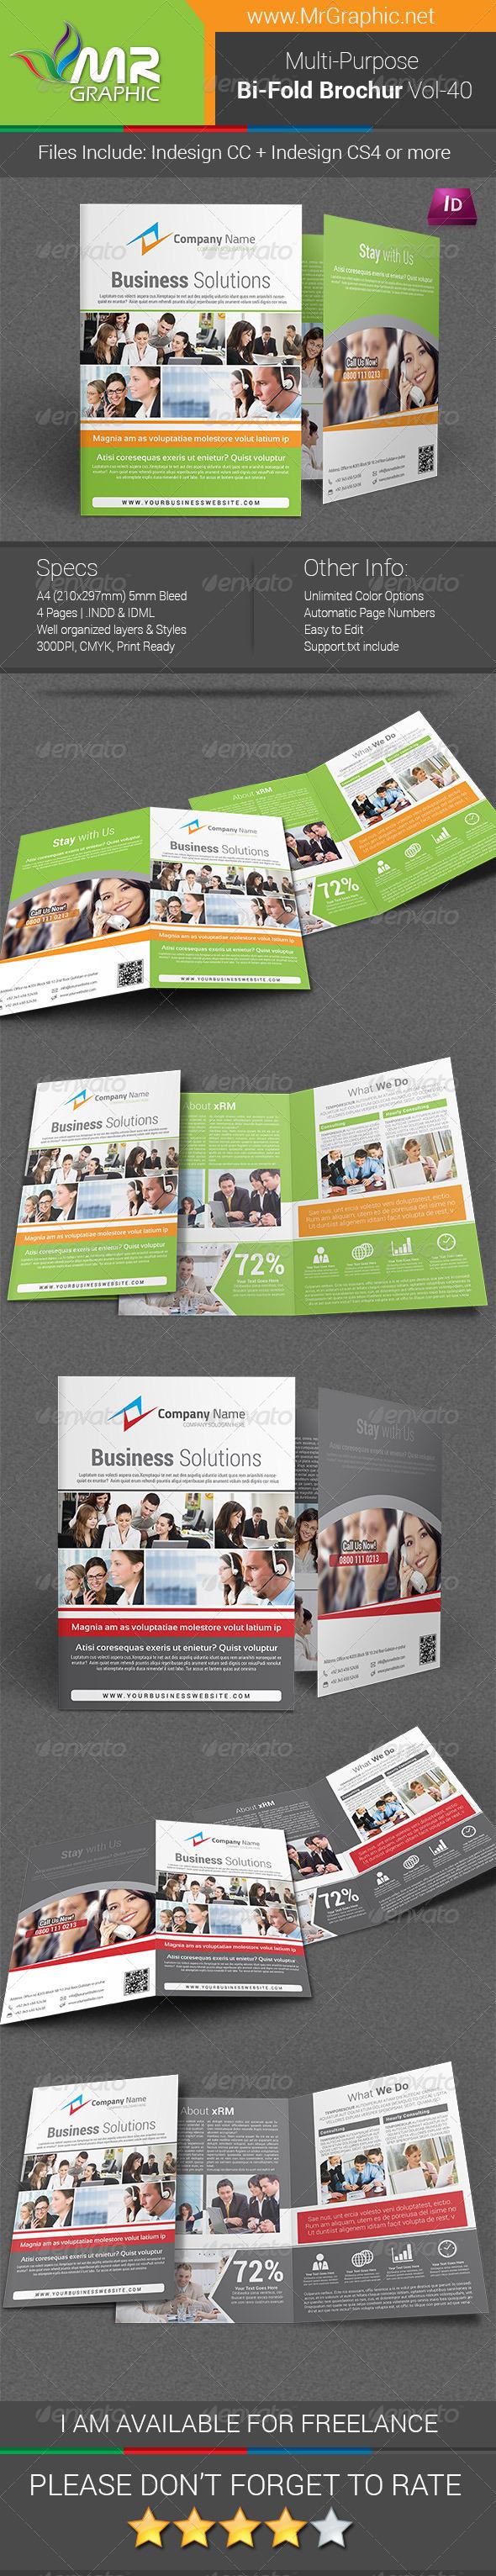 Multipurpose Bi-fold Brochure Template Vol-40 - Corporate Brochures